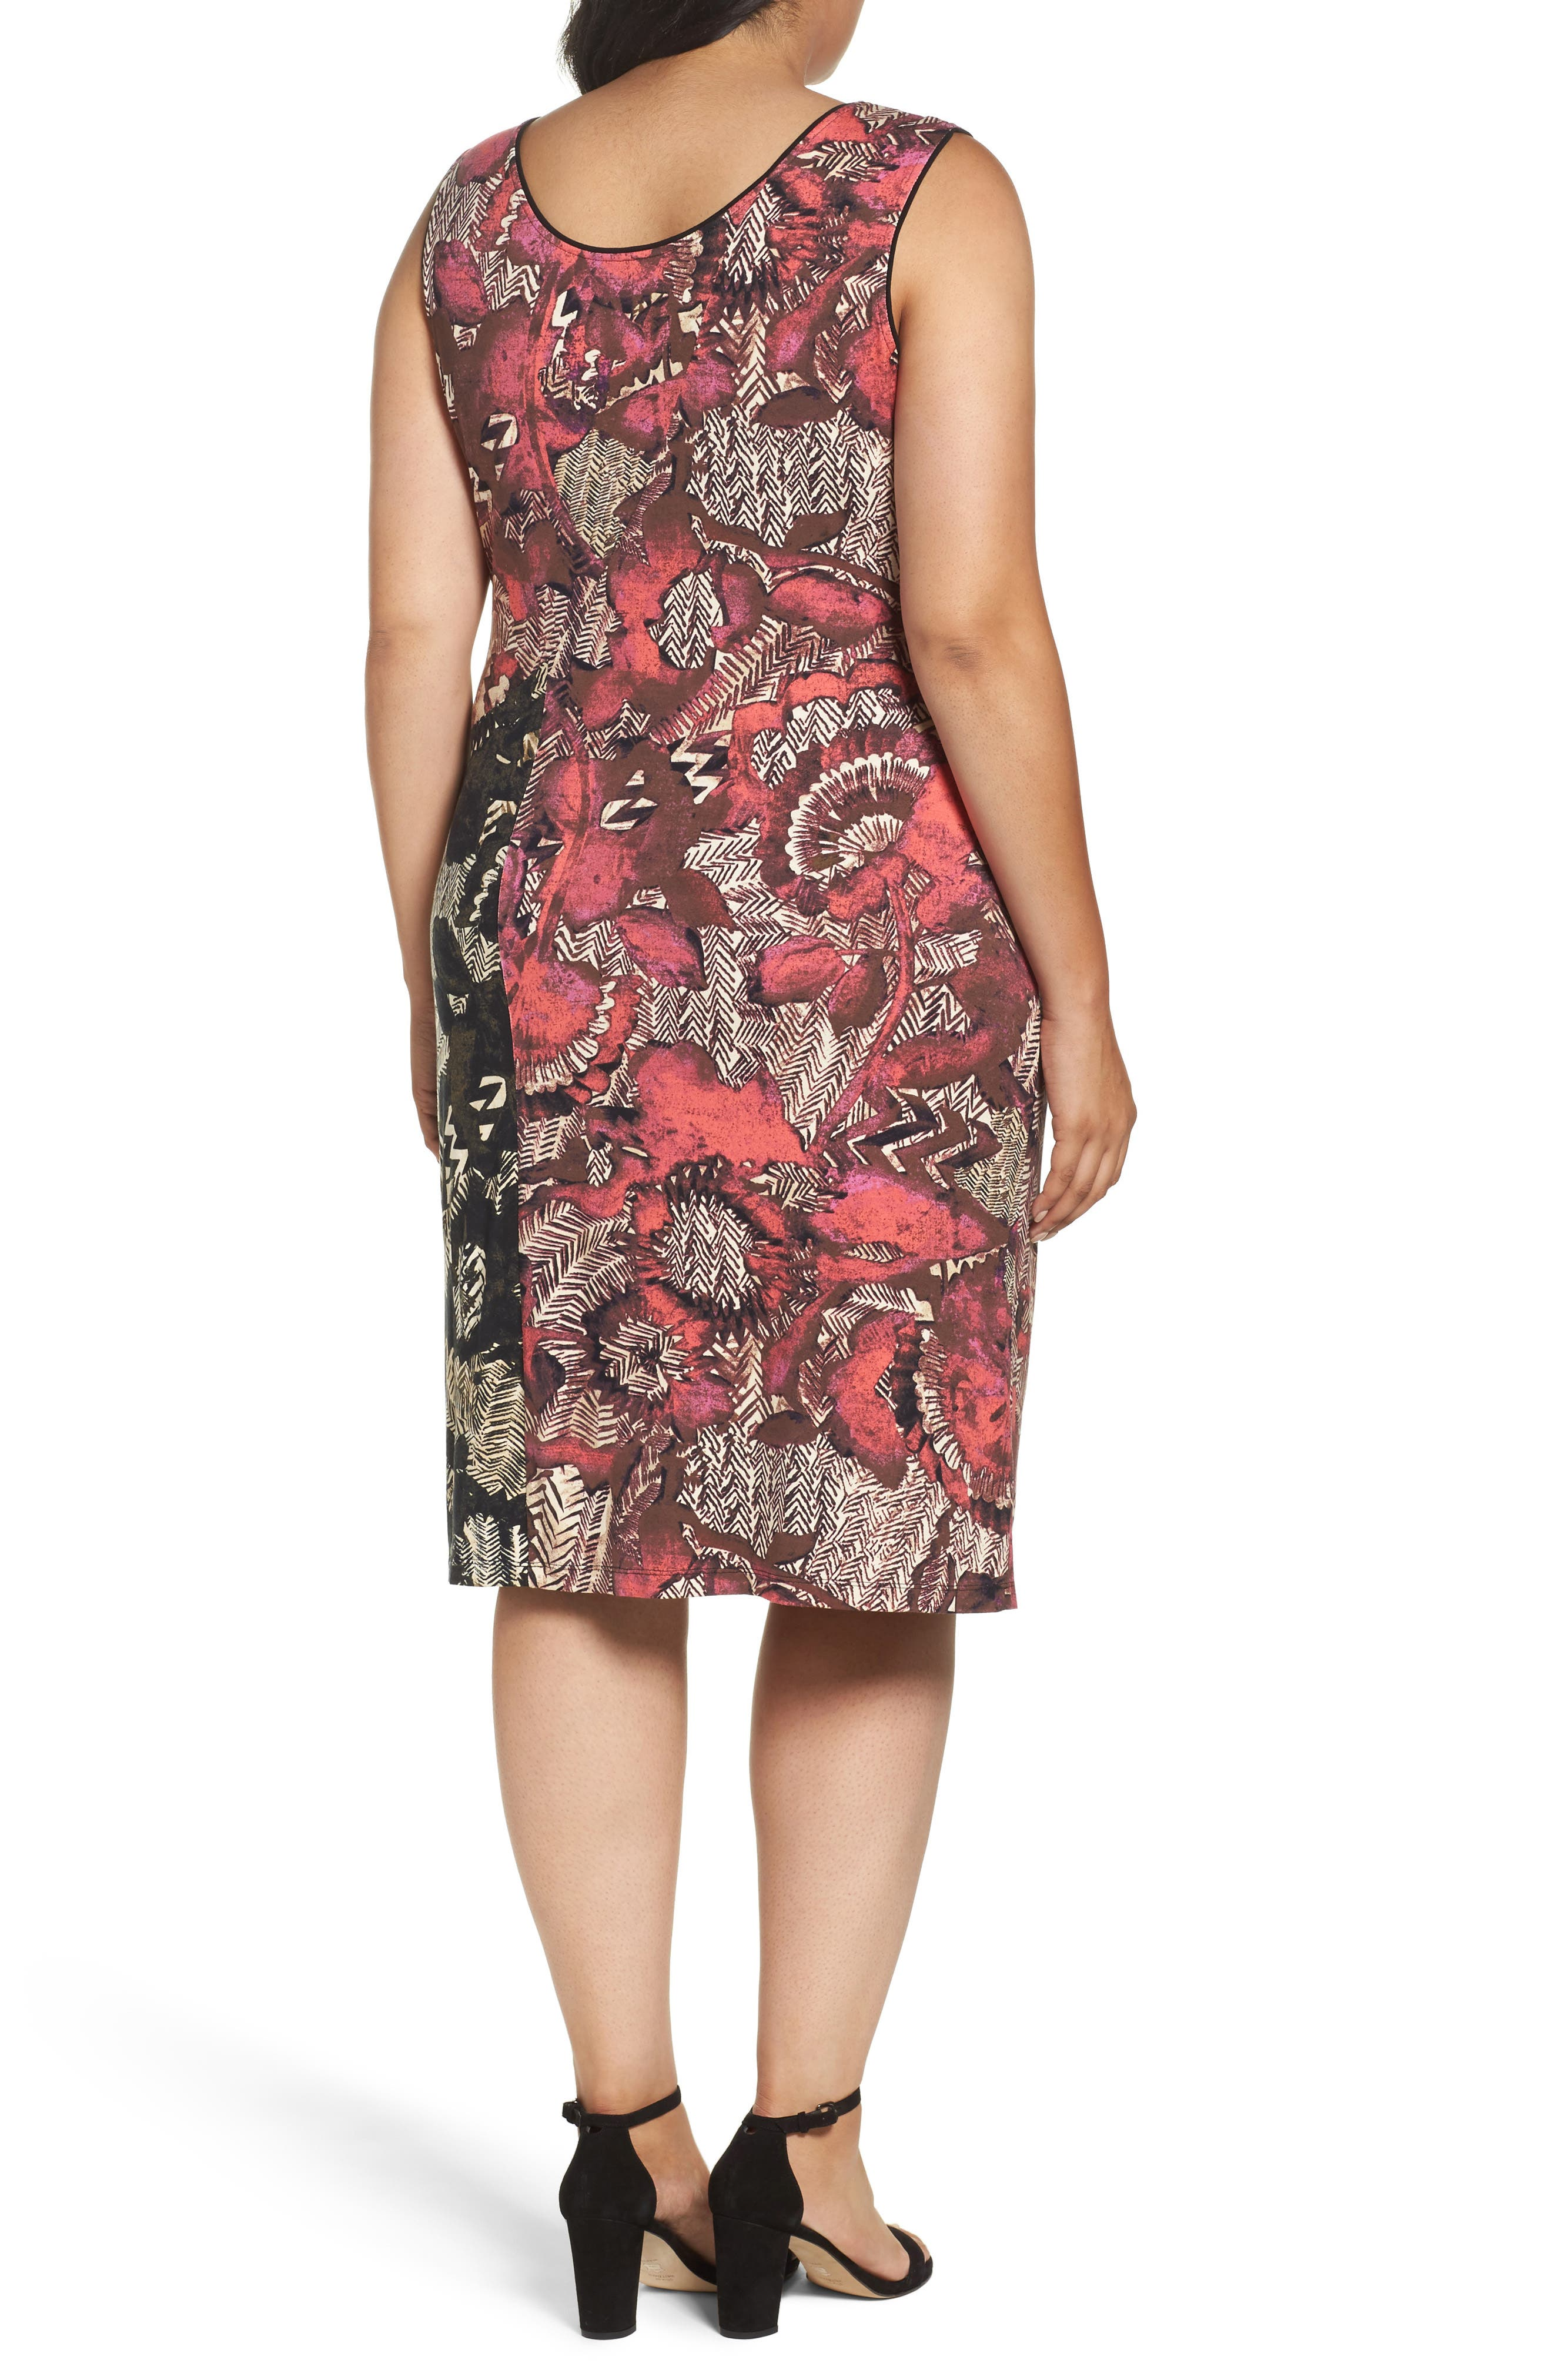 Etched Floral Dress,                             Alternate thumbnail 2, color,                             MULTI